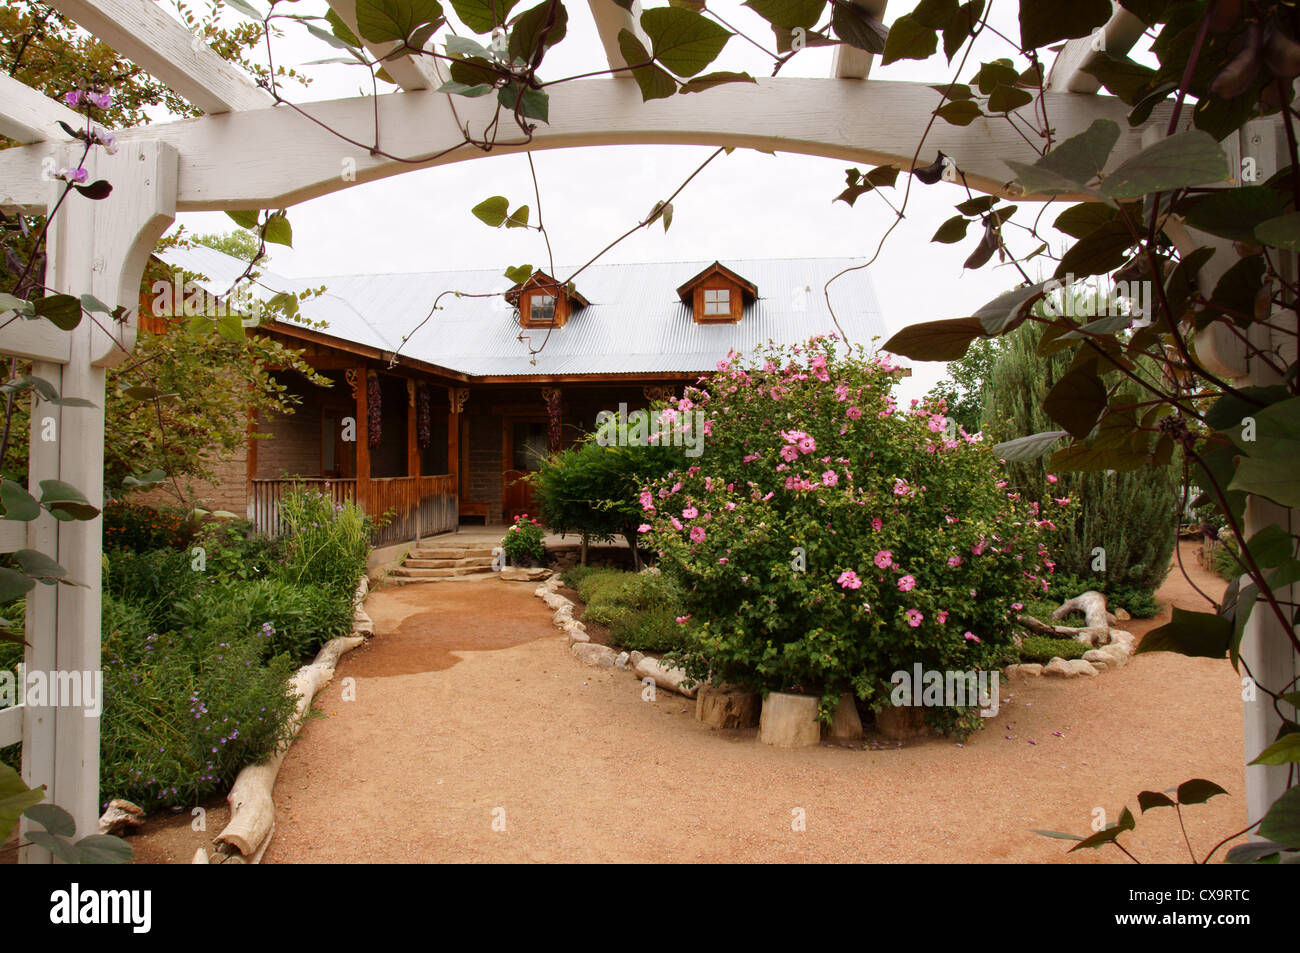 apieceofrainbow easy diy arched ideas a enchanting trestle growing garden structures vertical trellis